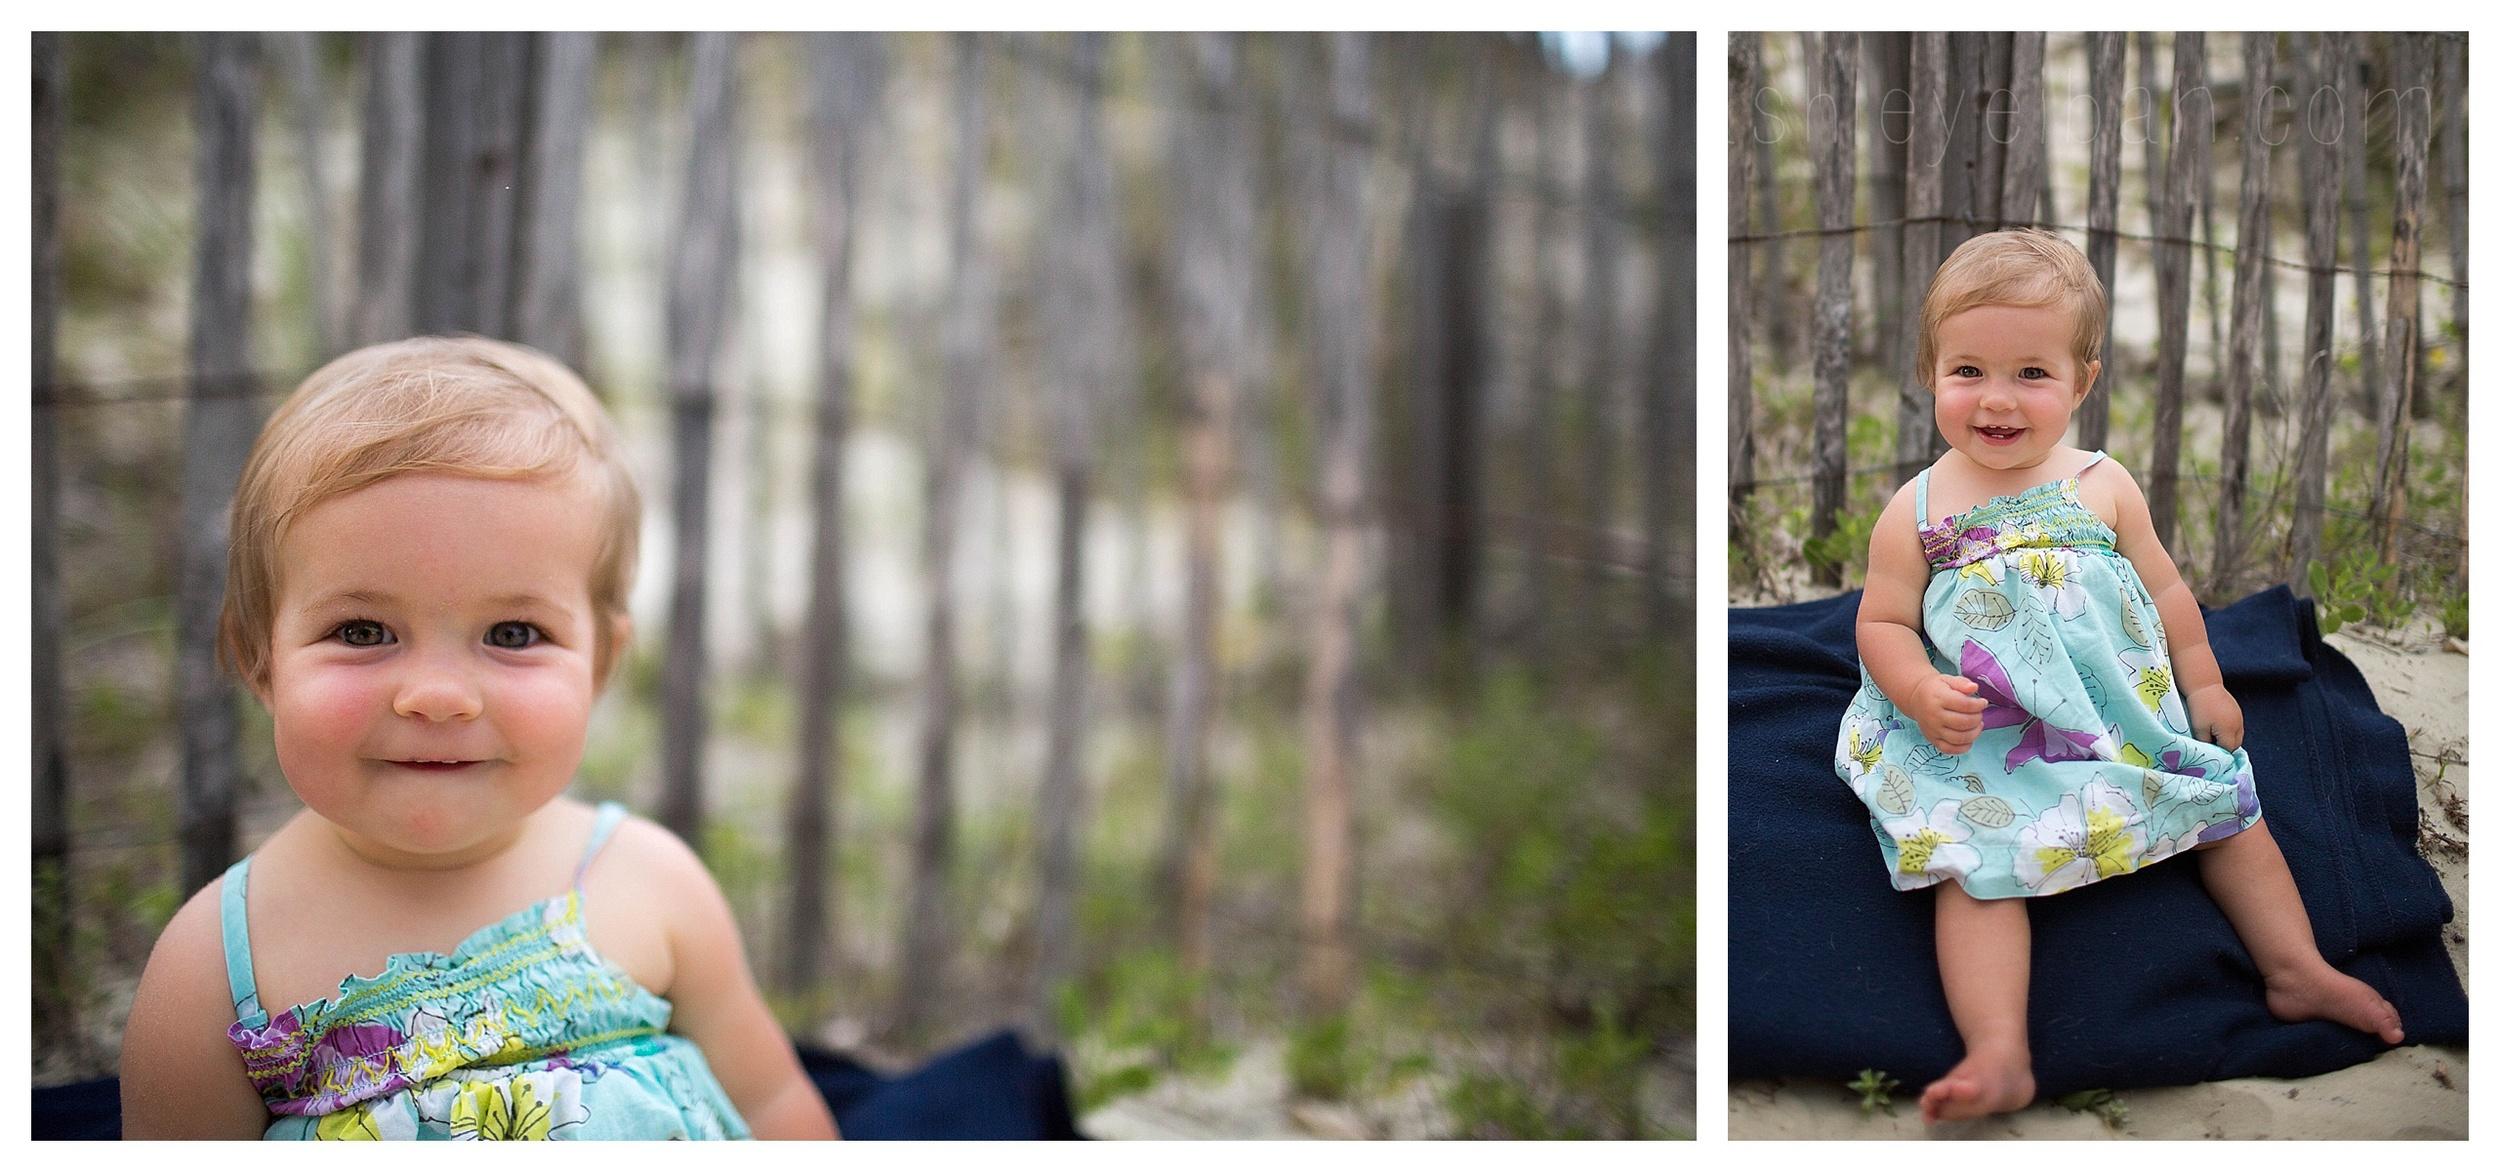 Sunset Beach Wedding & Portrait Photographer || Ashley Eiban Photography || www.ashleyeiban.com